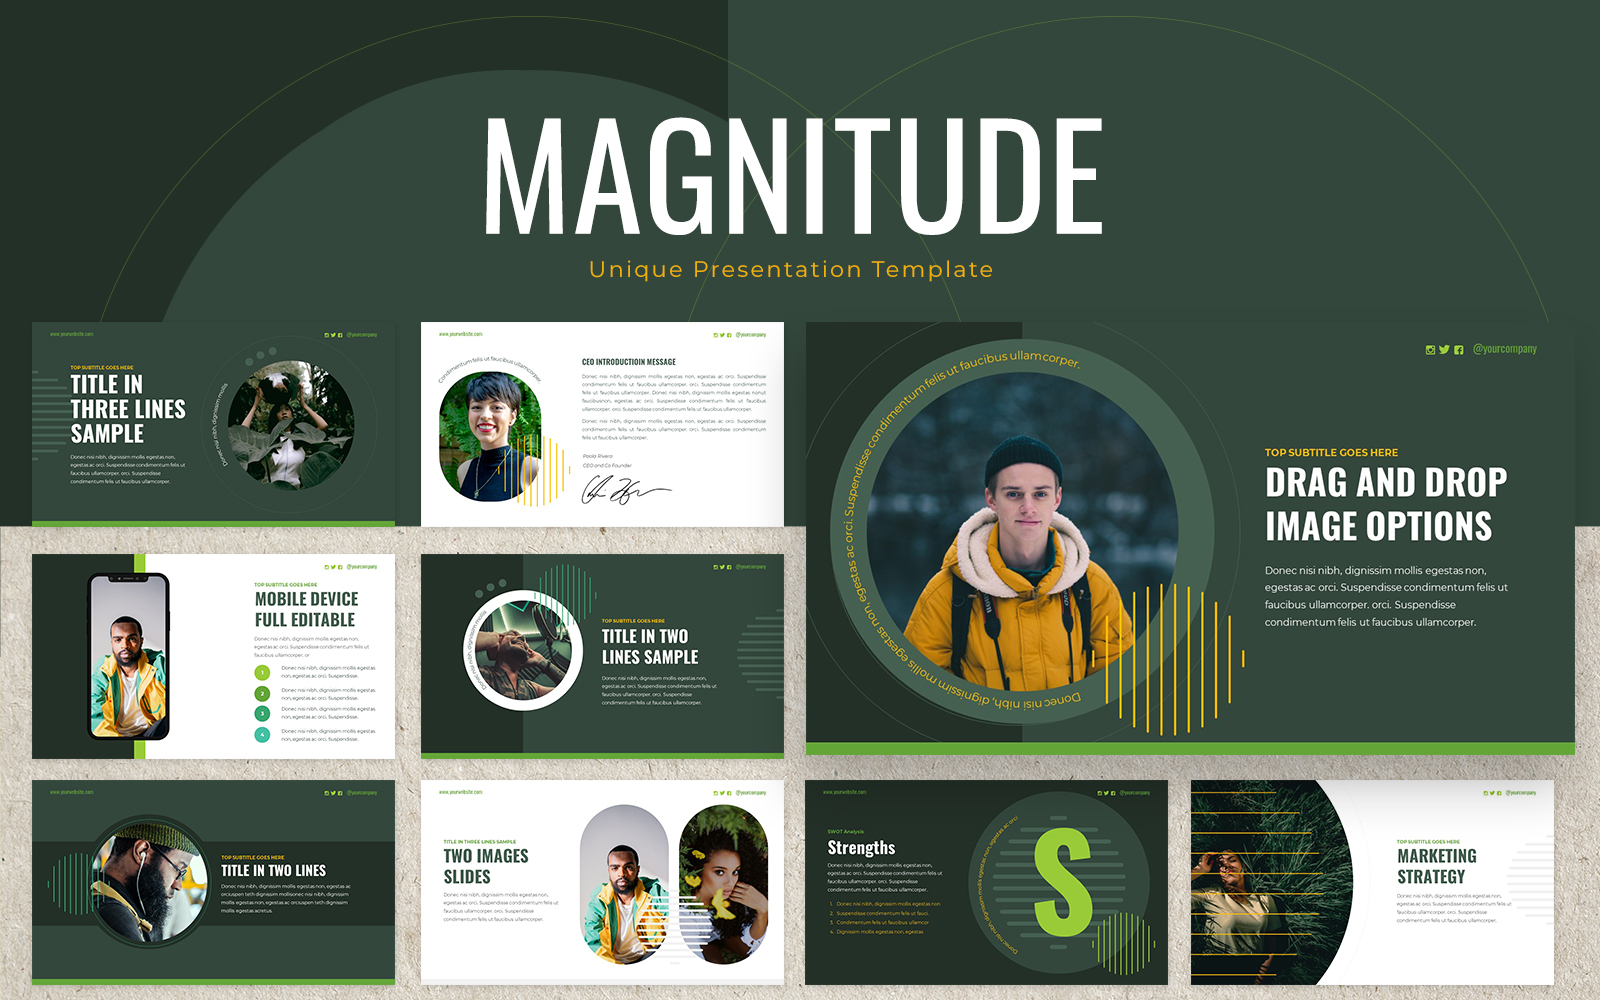 Magnitude Powerpoint Presentation Template